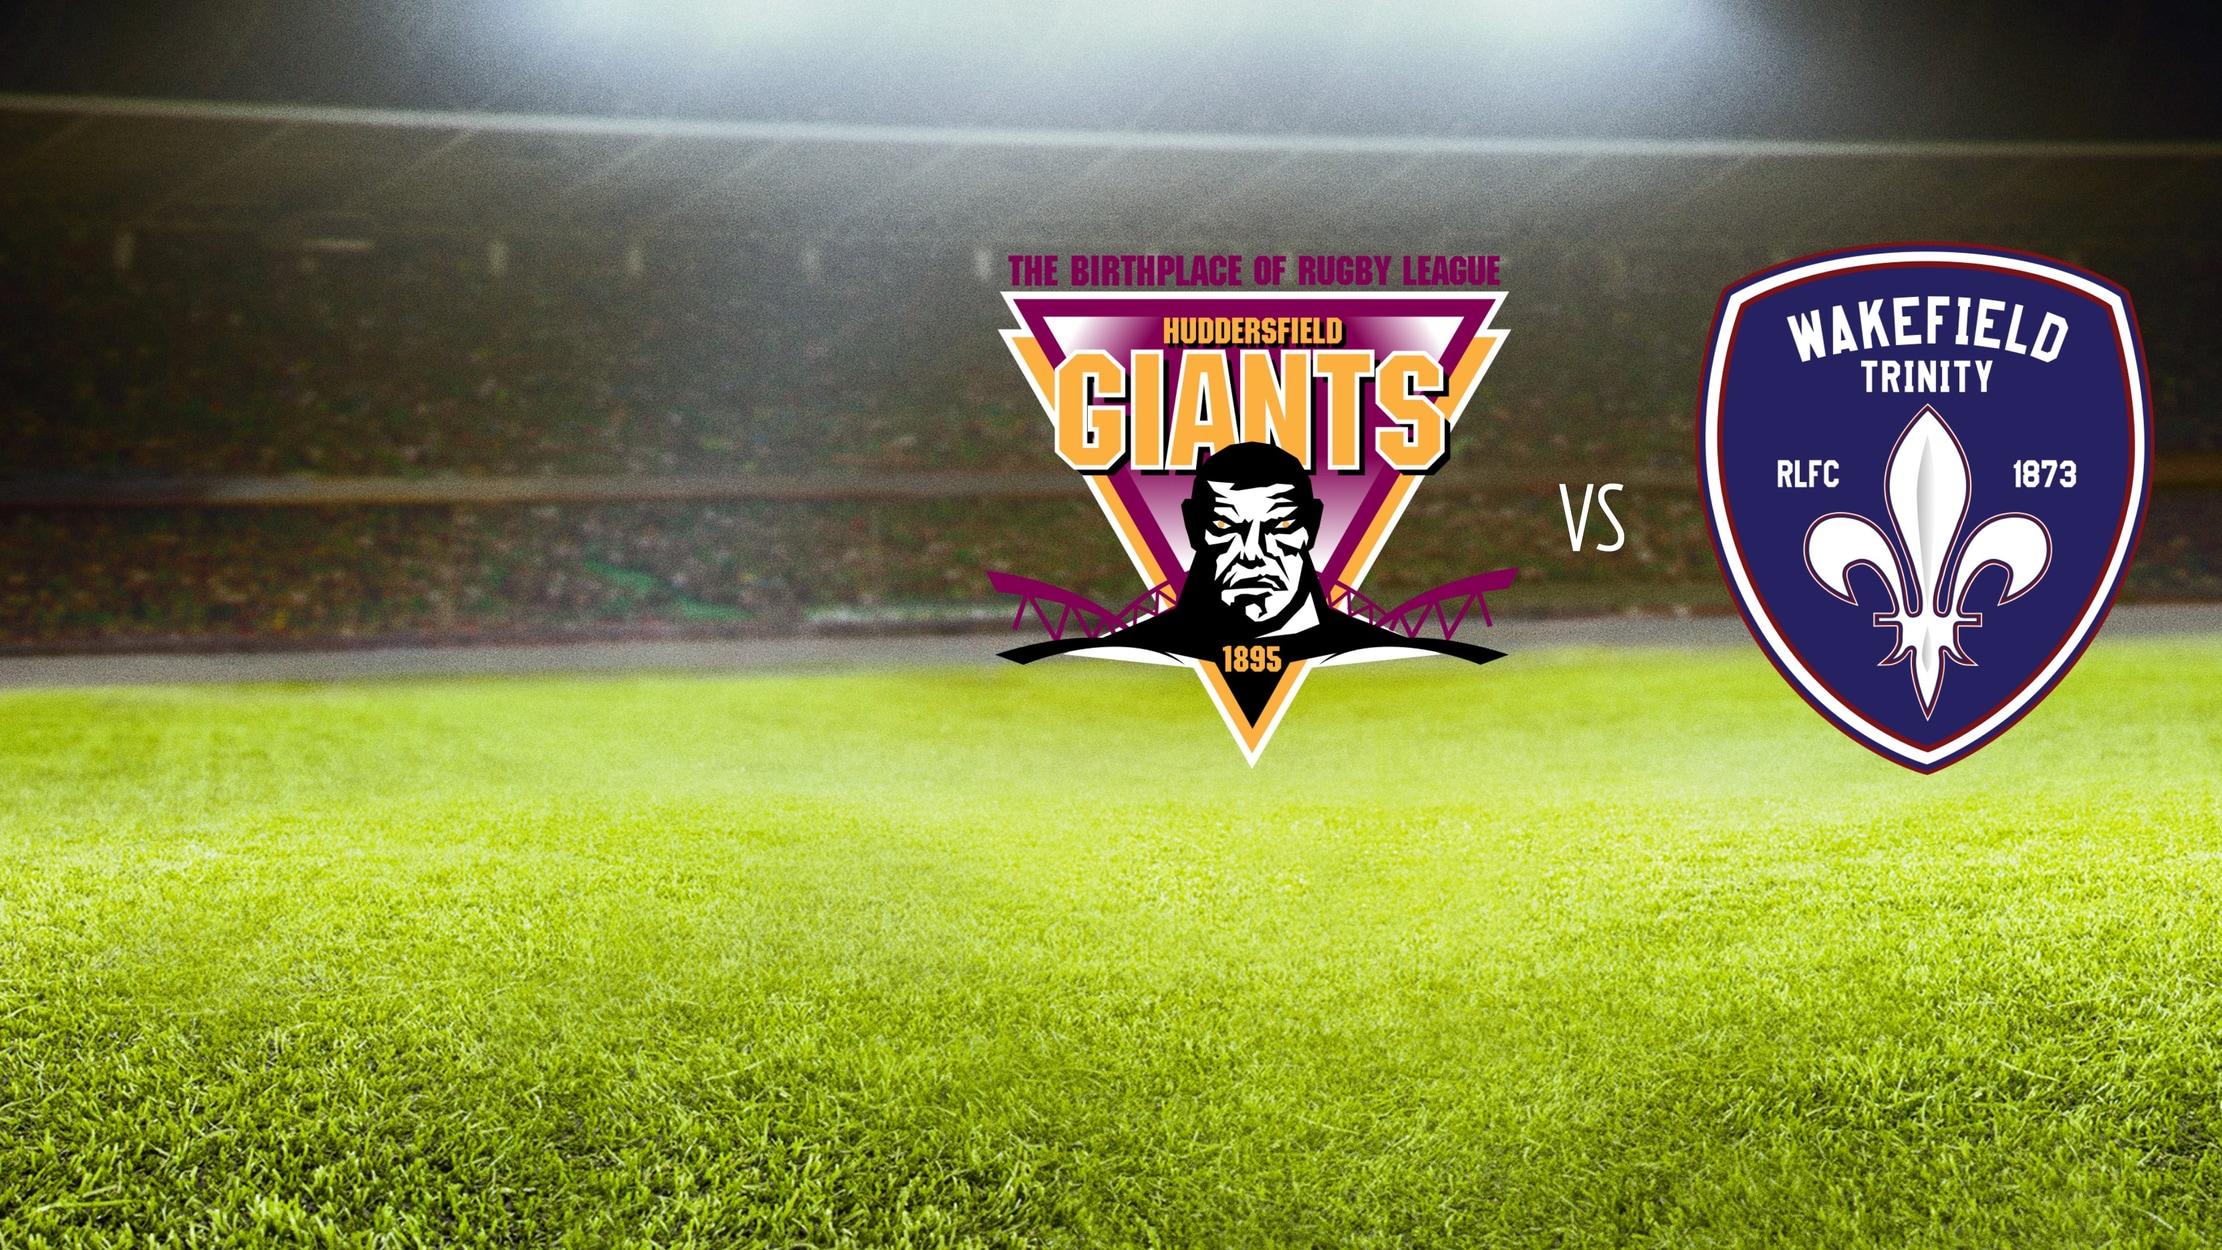 Rugby Super League - Huddersfield Giants vs. Wakefield Trinity seriesDetail